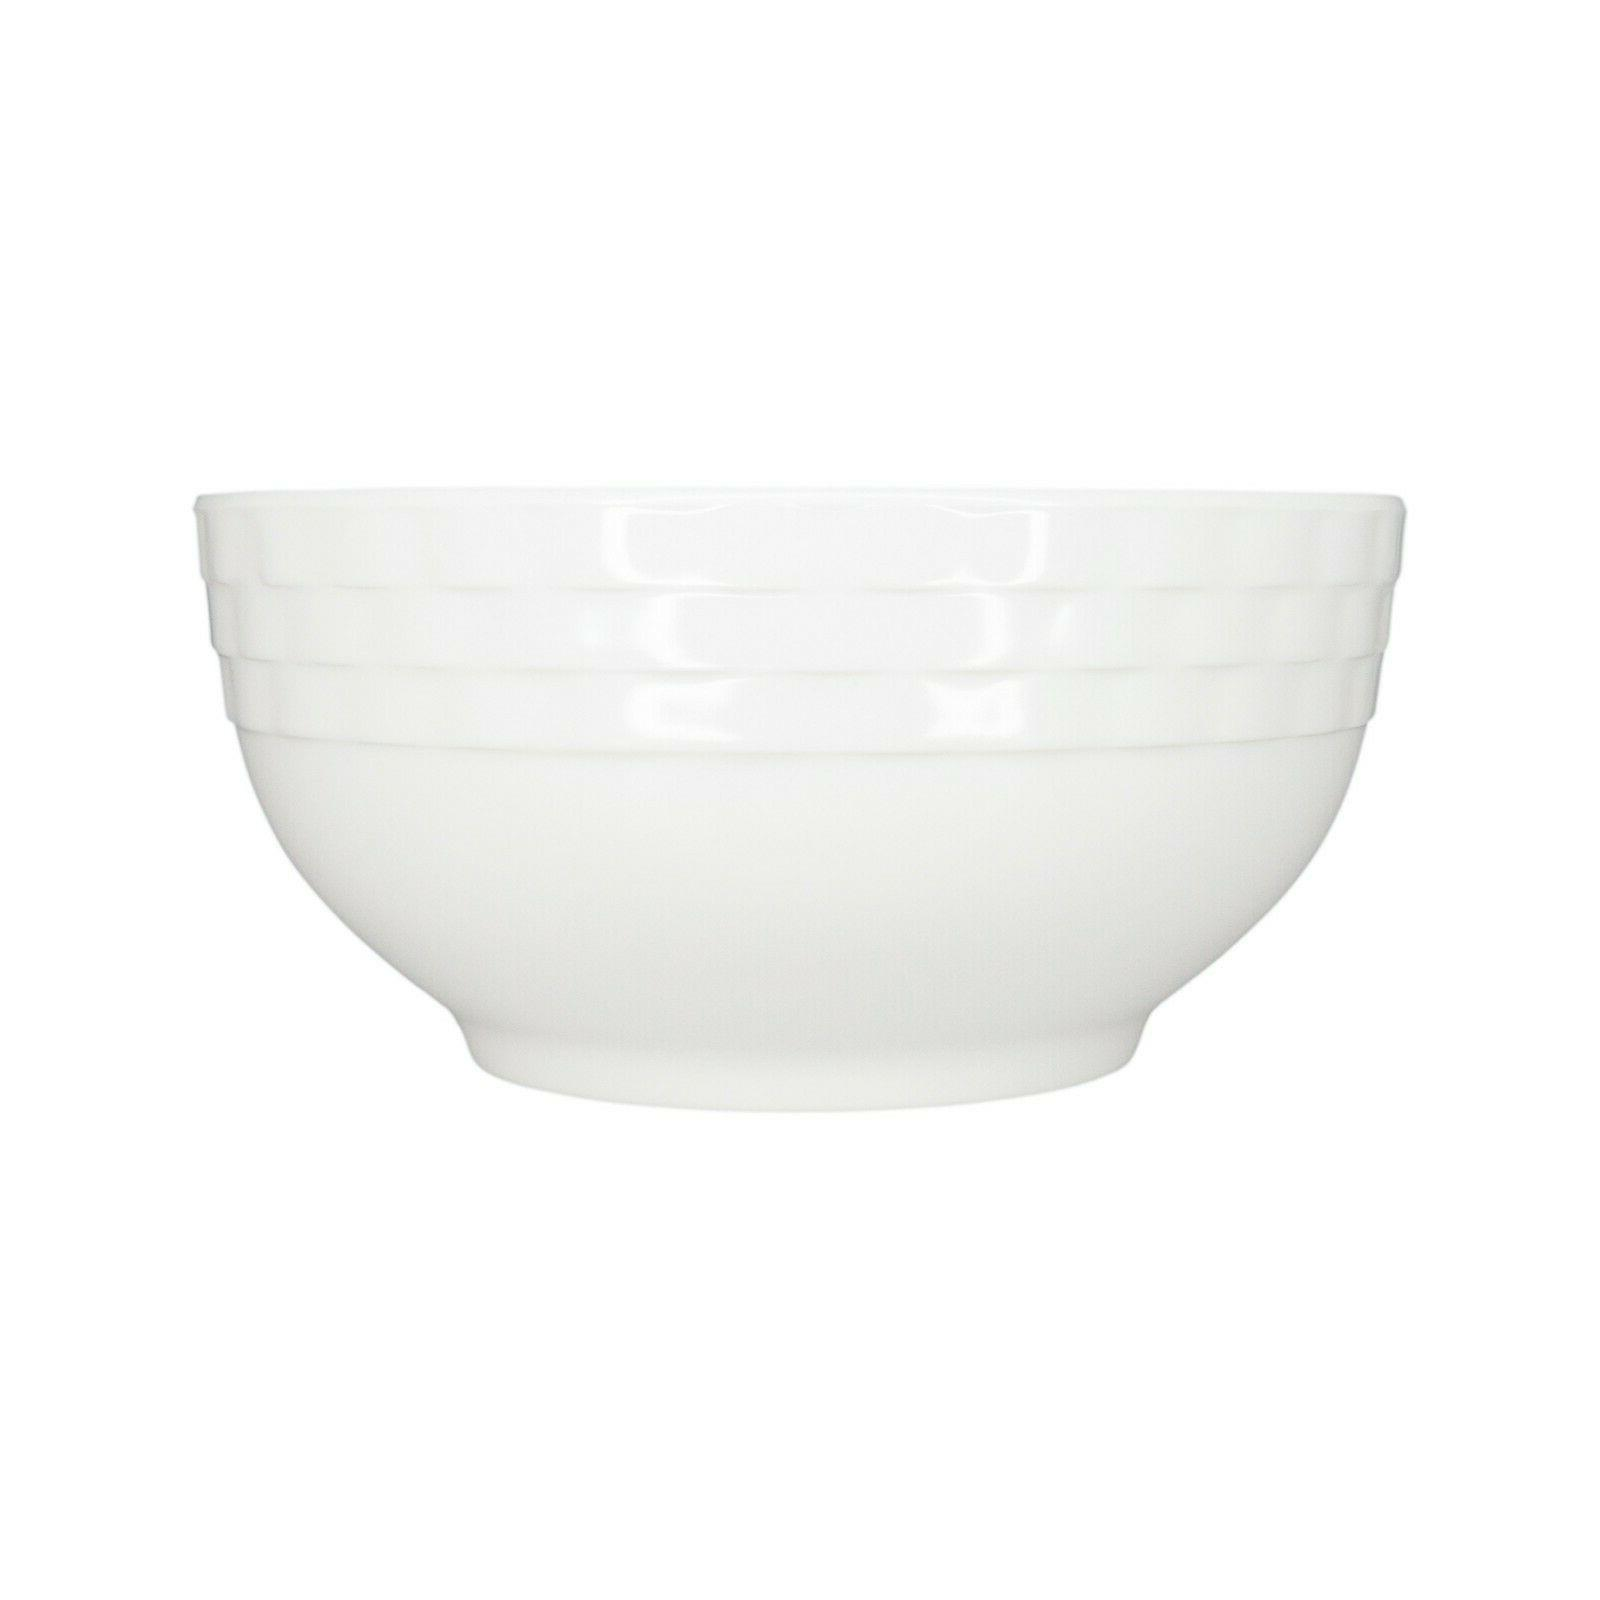 222 White Piece Dinnerware